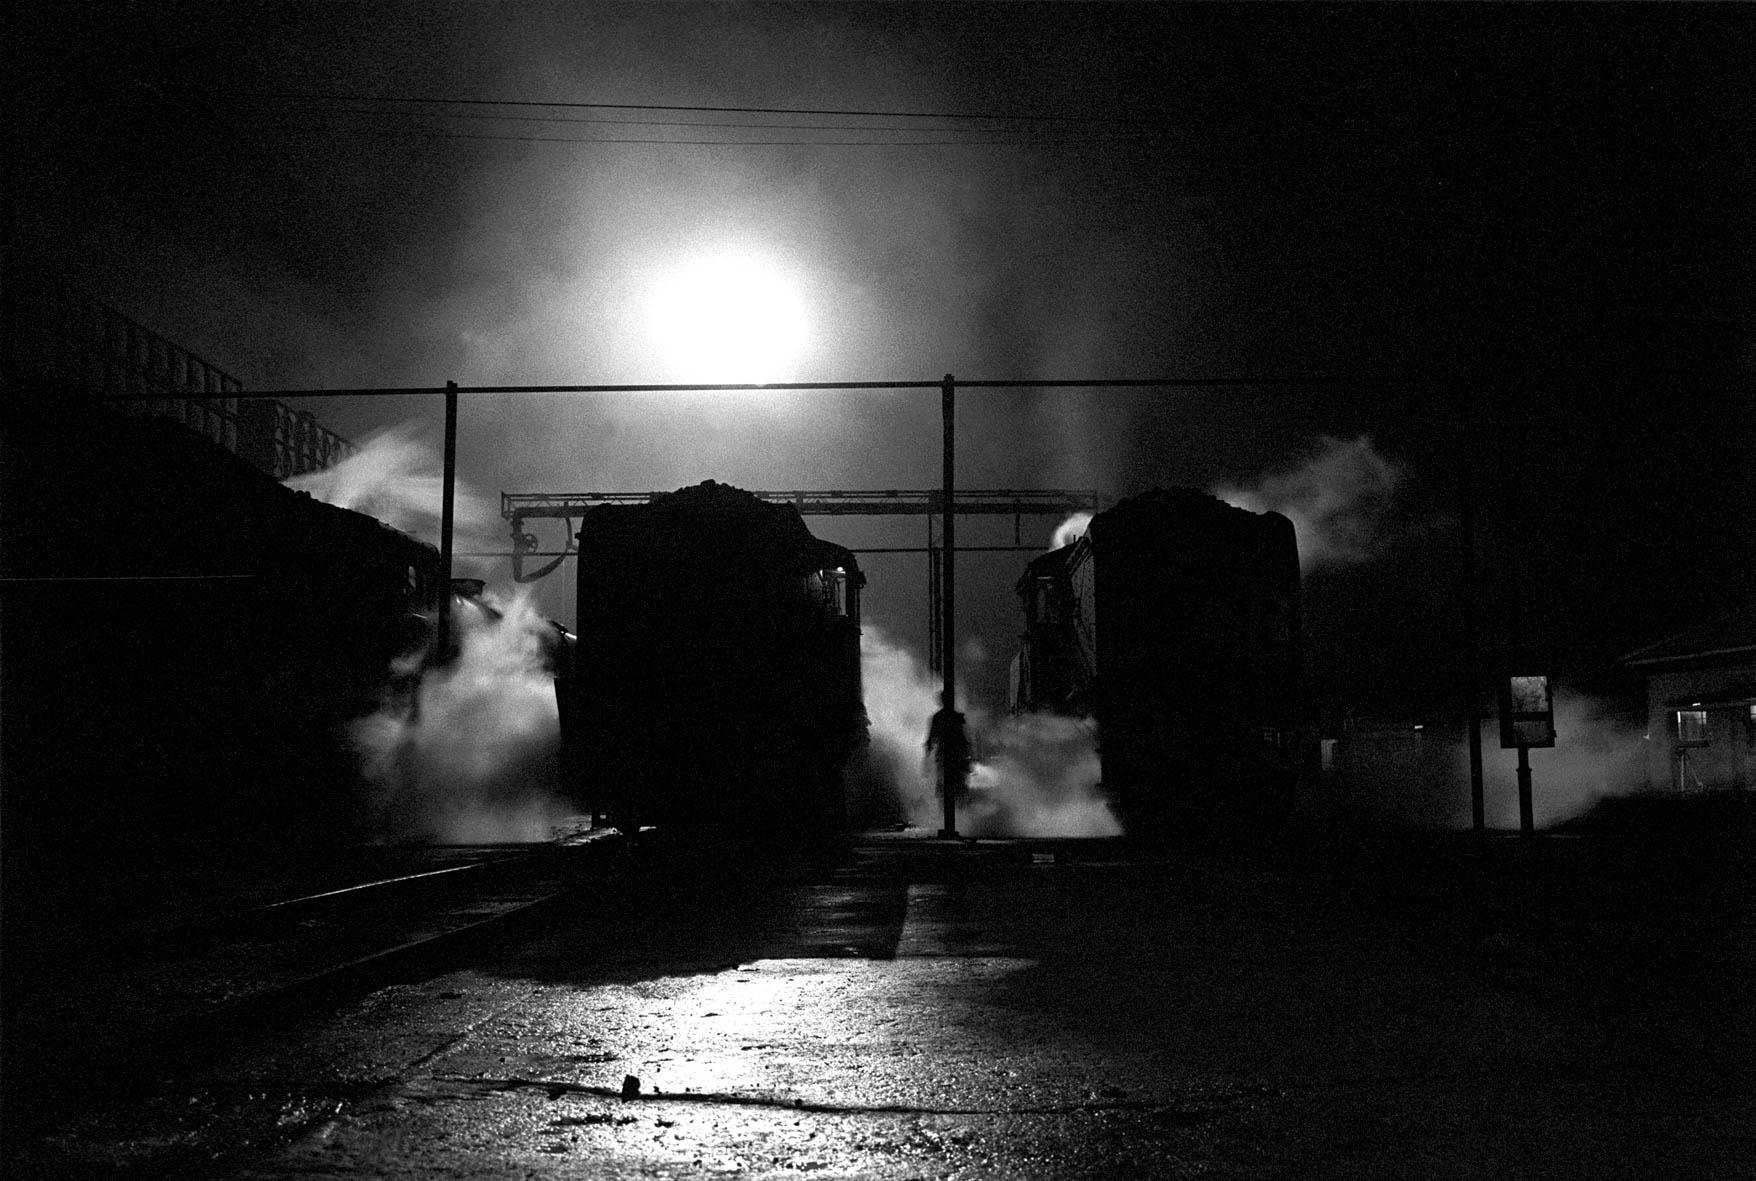 Zimbabwe, Bulawayo. 1986. The National Railways of Zimbabwe (NRZ) workshop.